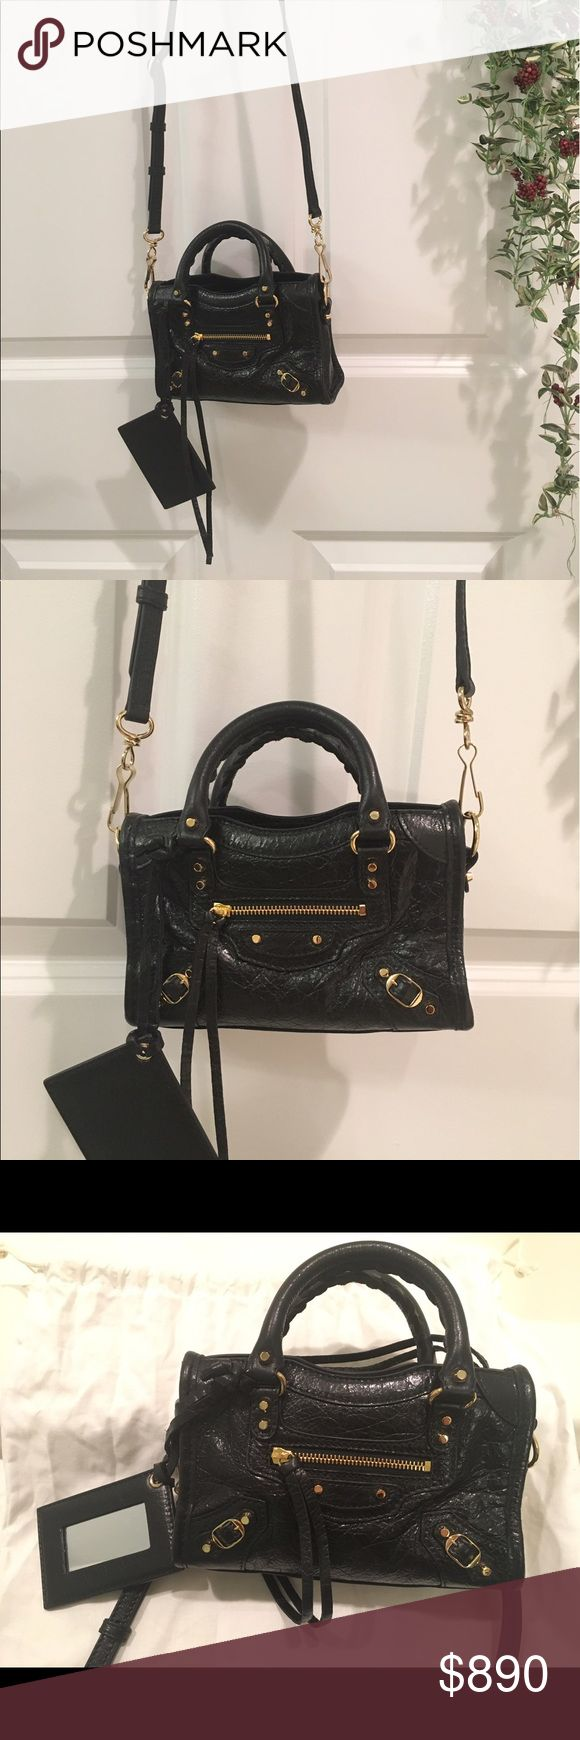 Balenciaga Classic Nano City *New* and 100% authentic. Dust bag included. Thanks! Balenciaga Bags Mini Bags